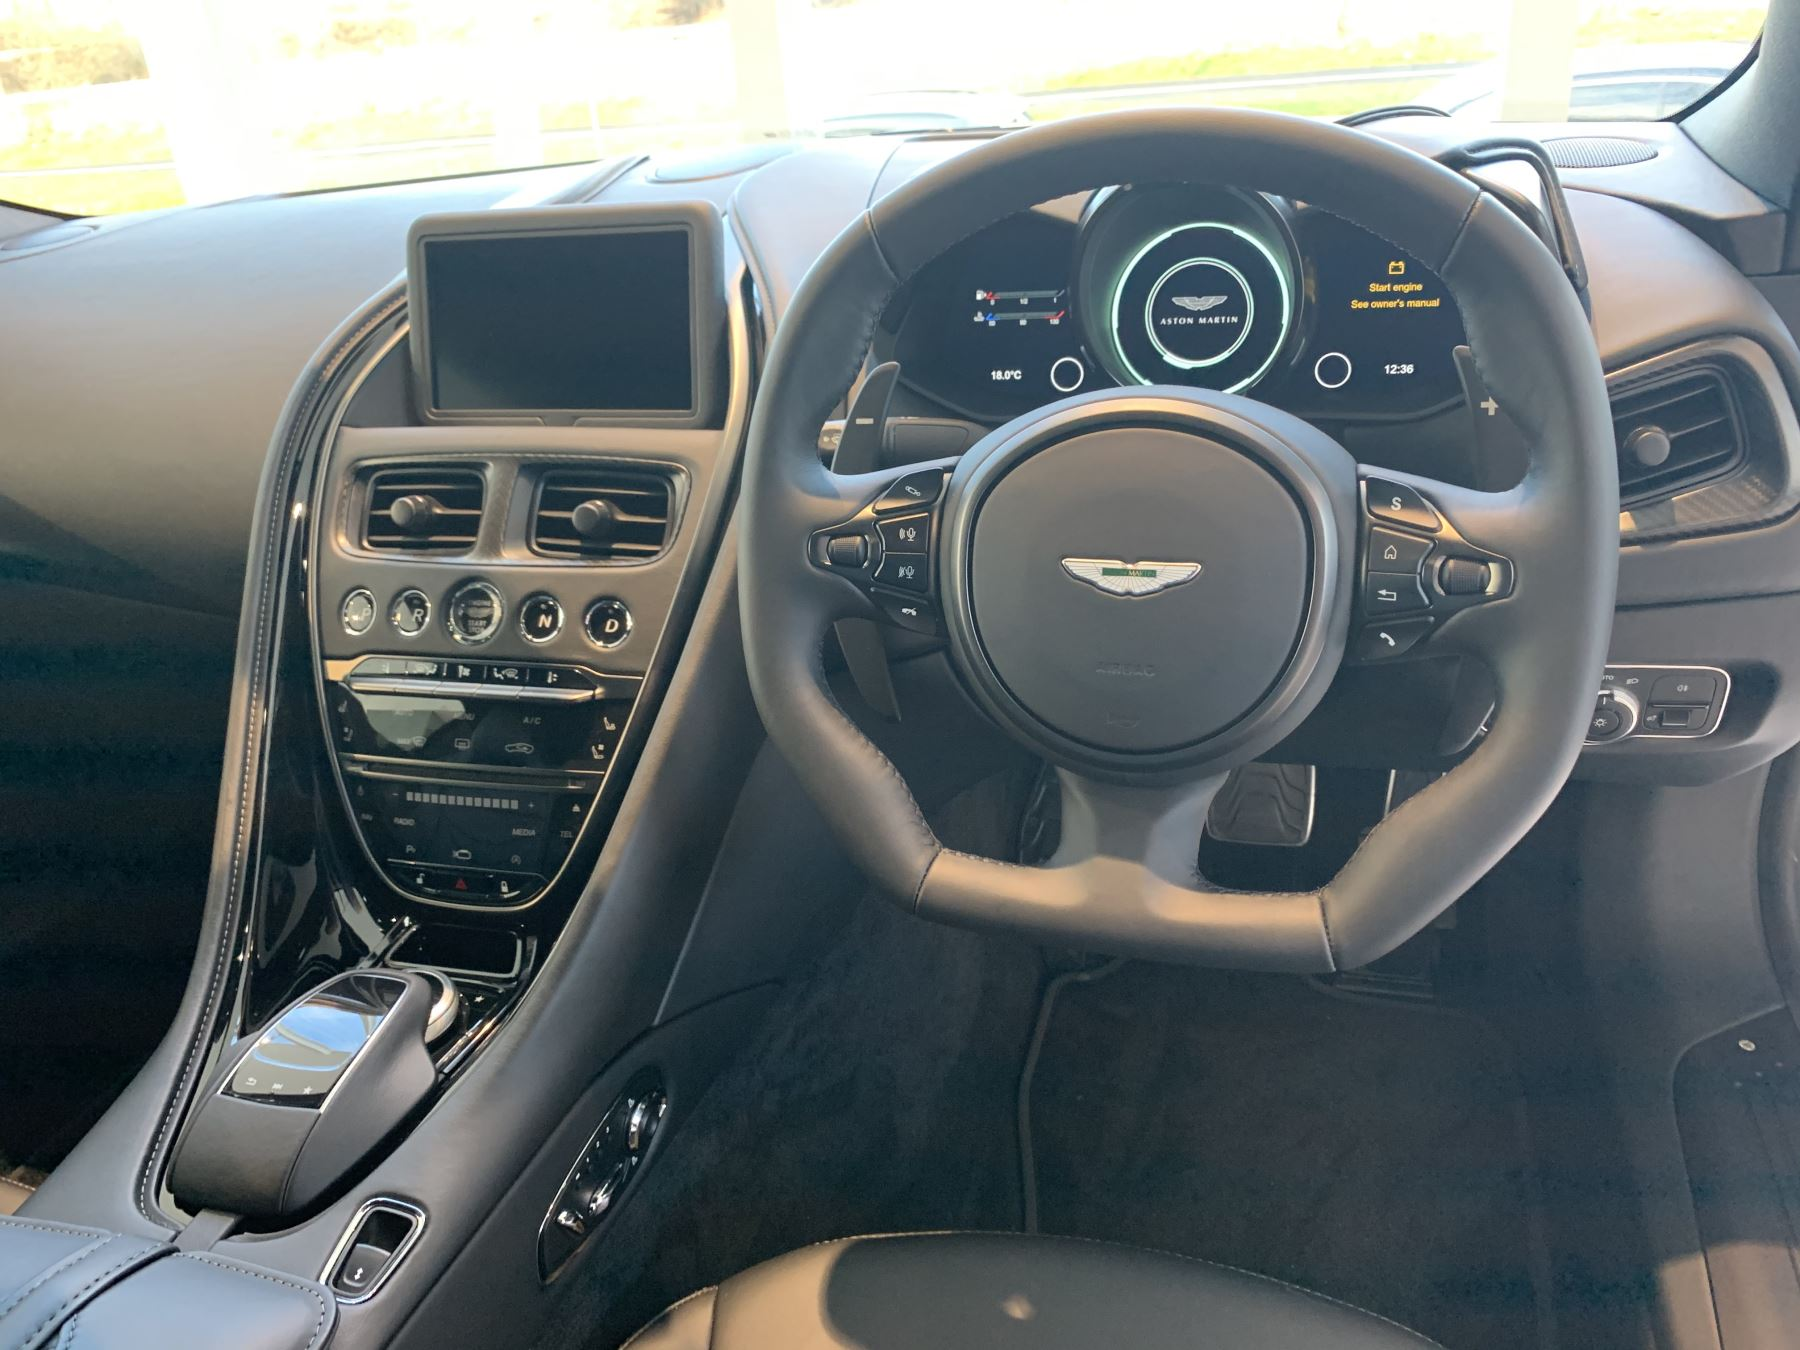 Aston Martin DBS Superleggera V12 Superleggera 2dr Touchtronic Auto image 14